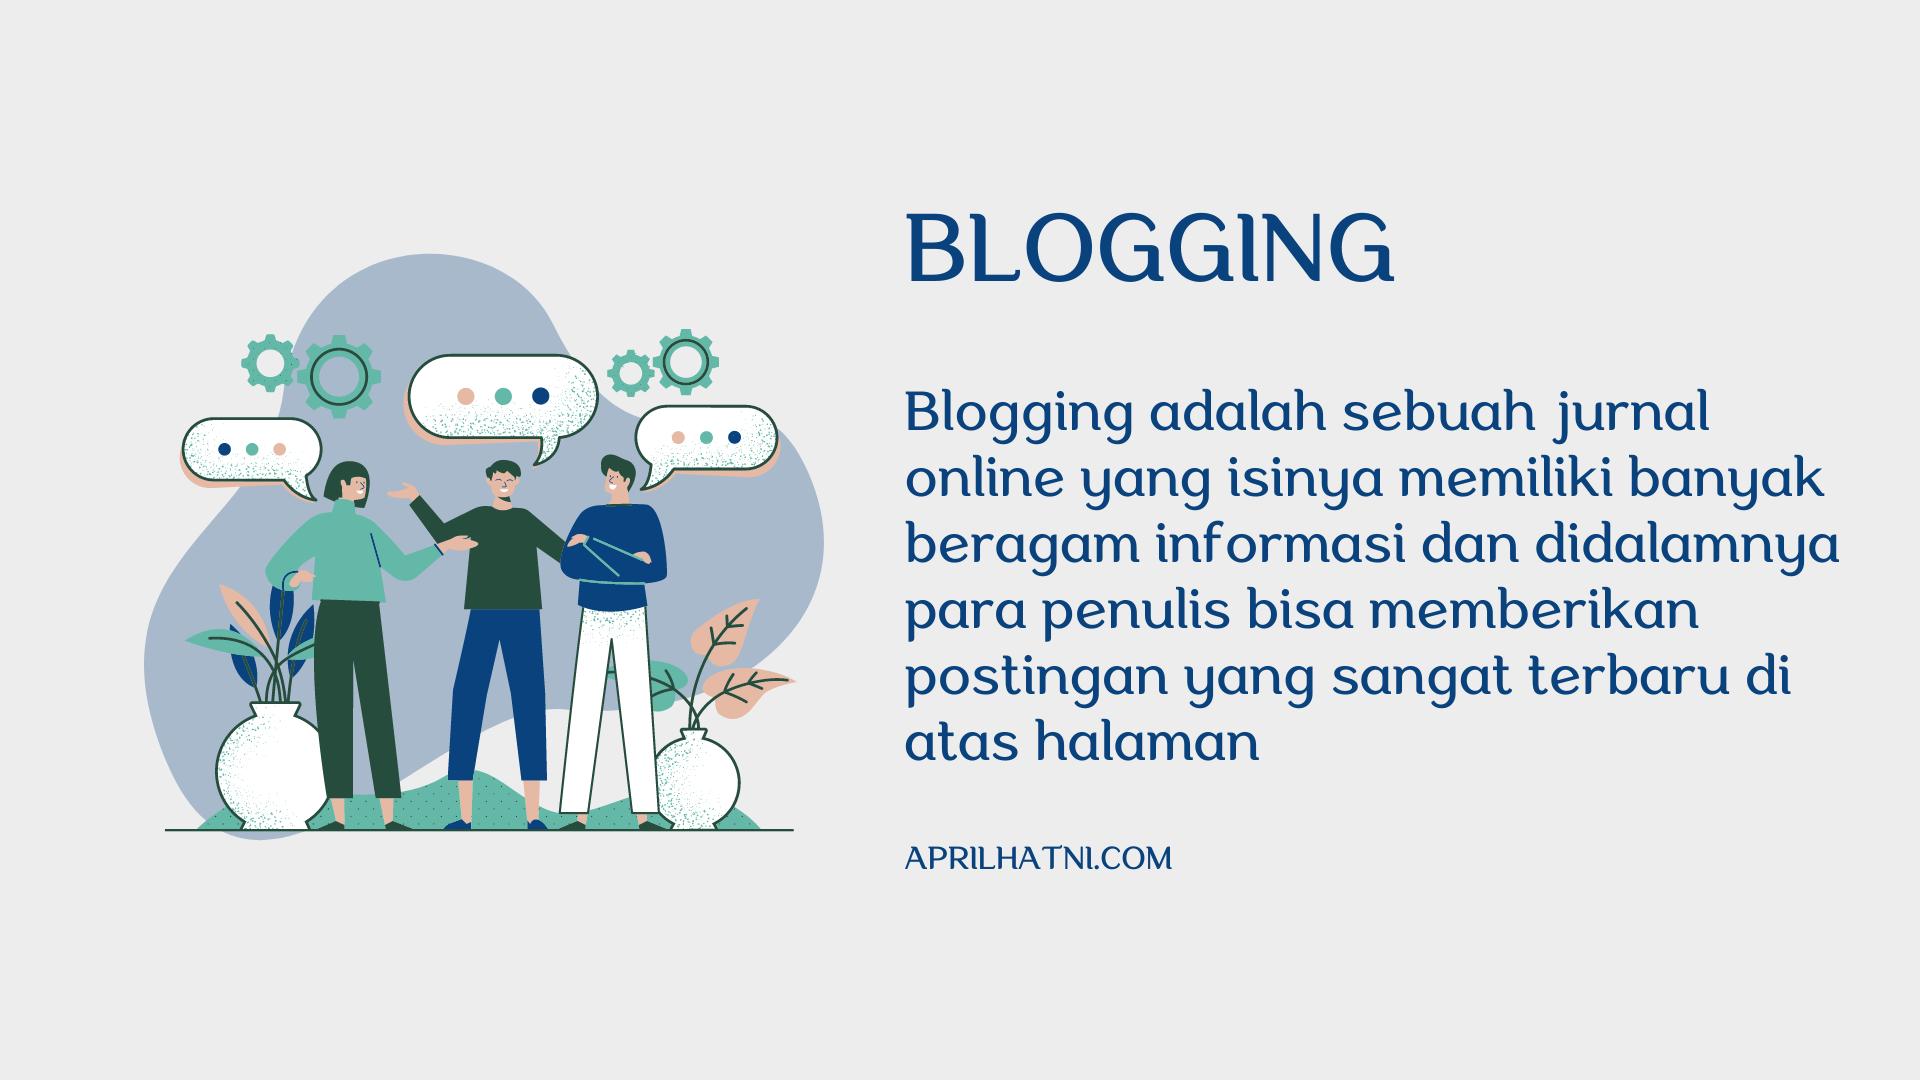 pengertian blogging